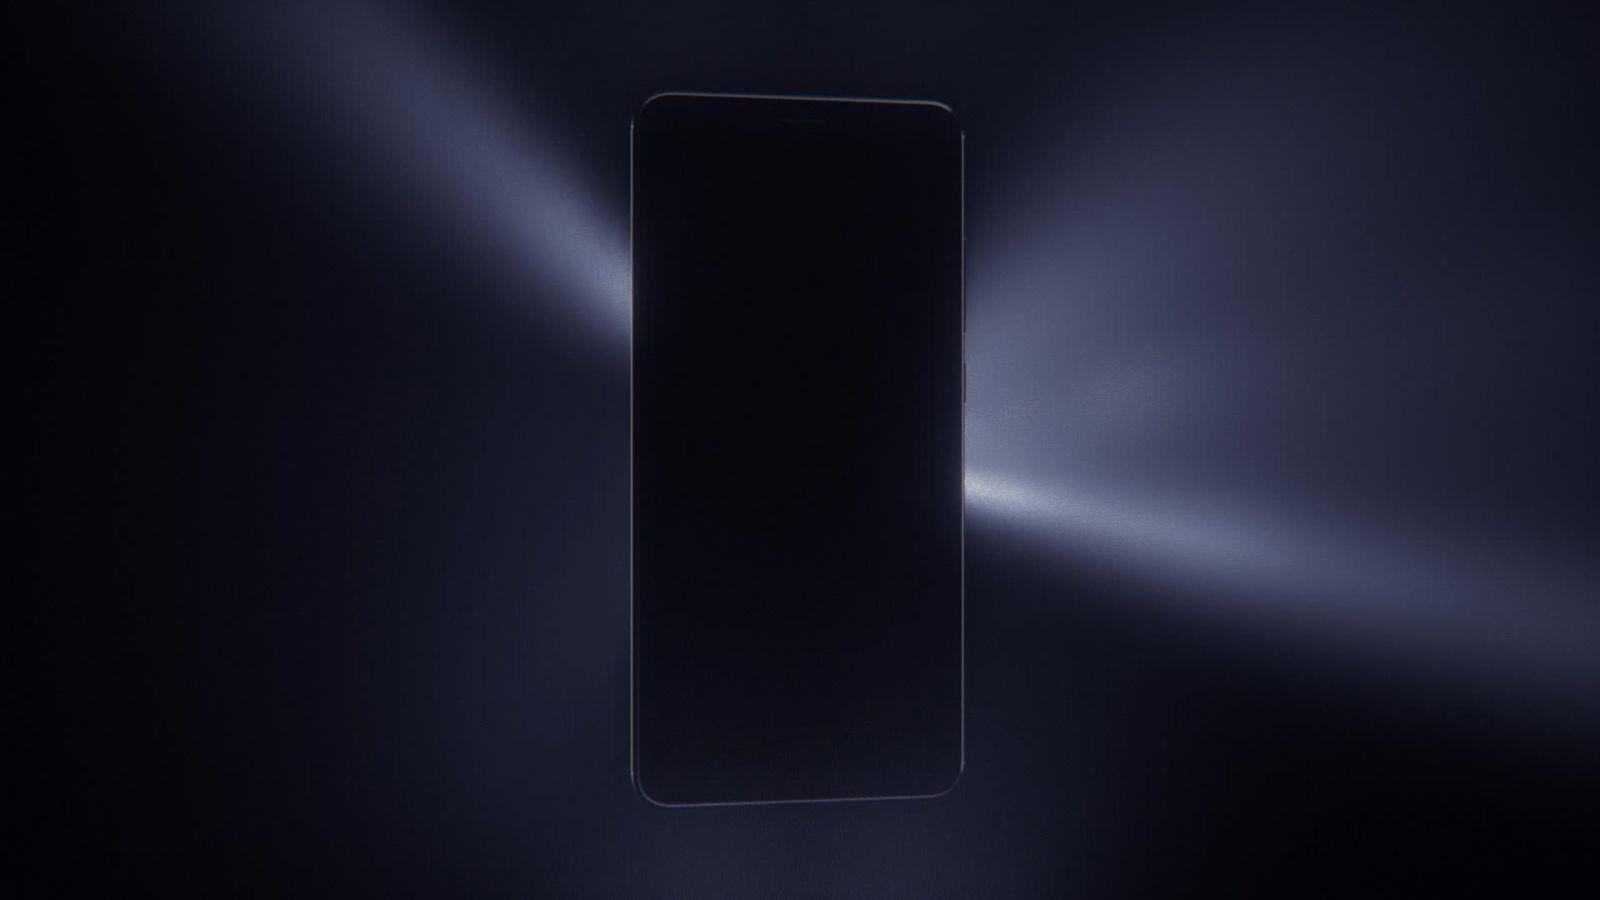 Xiaomi готовит смартфон с камерой 128 Мп и процессором Qualcomm